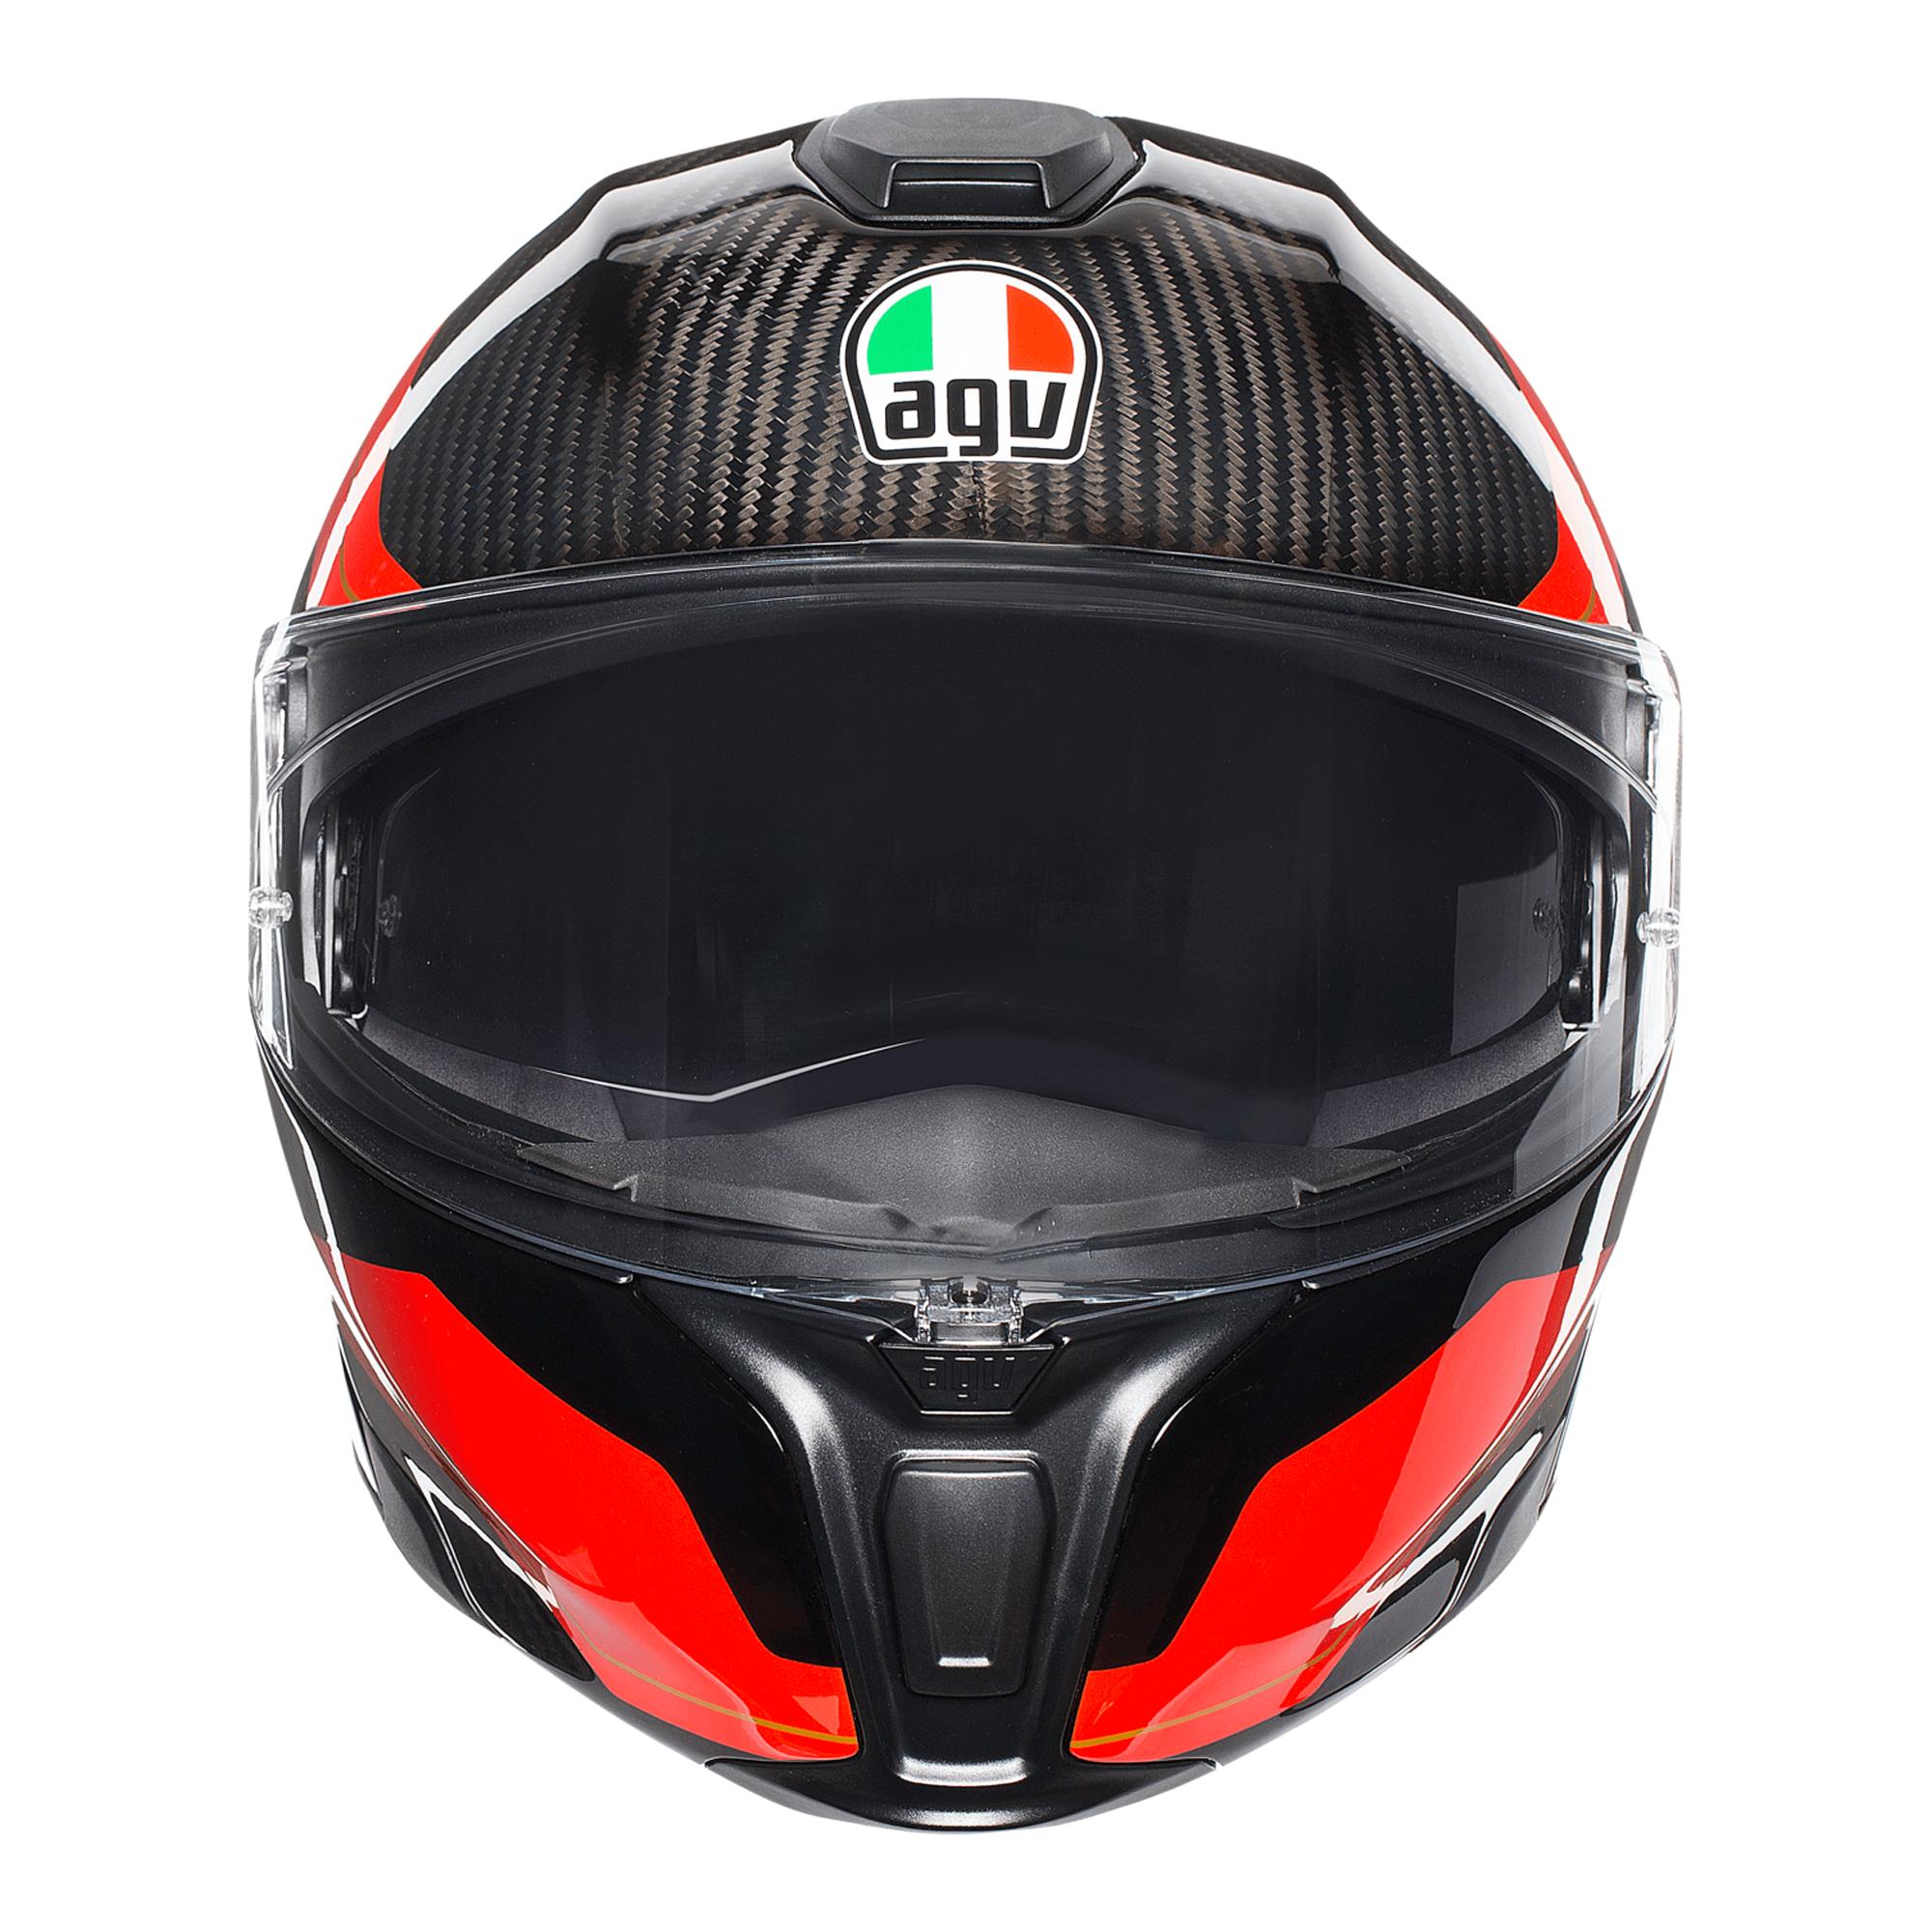 AGV Sportmodular Stripes | AGV Sportmodular | AGV helmets